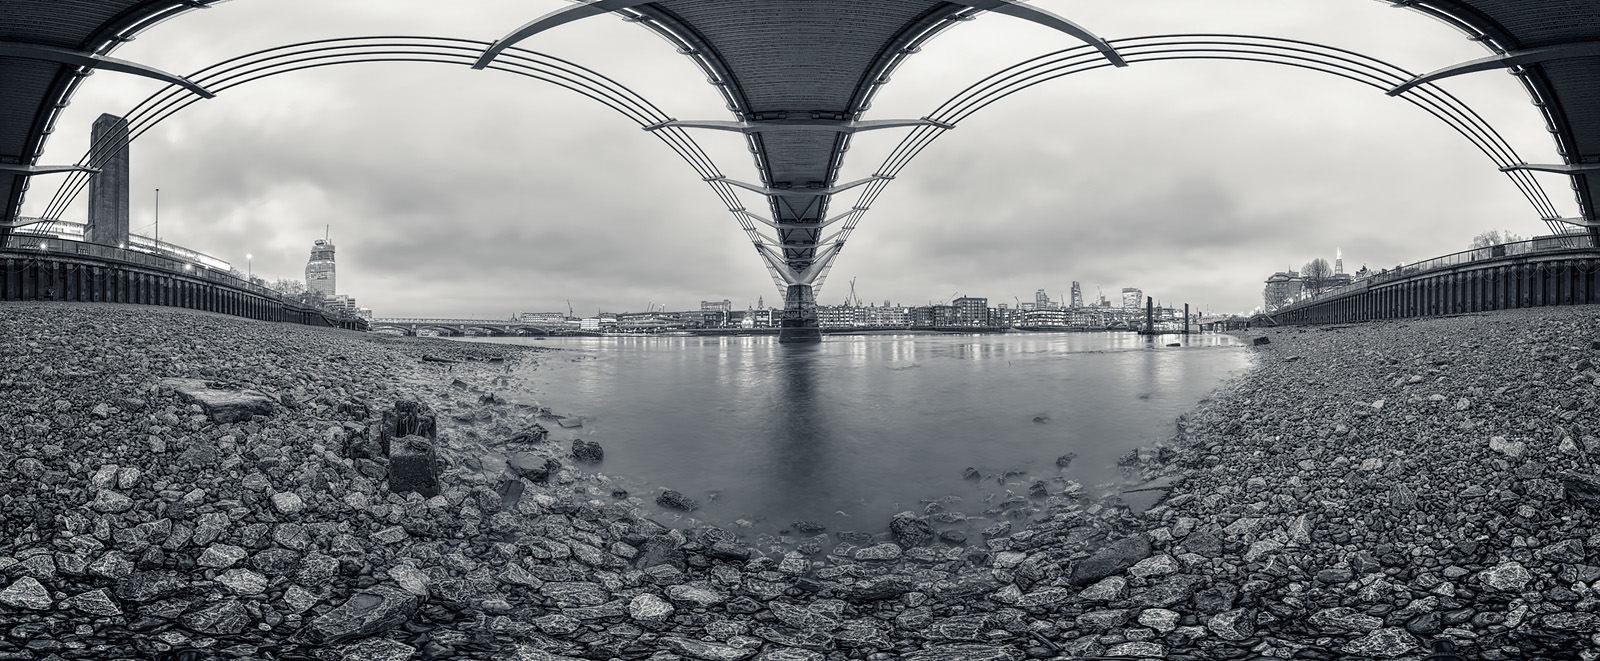 Under The Bridge Acrylic - London Black & White Fine Art Photo